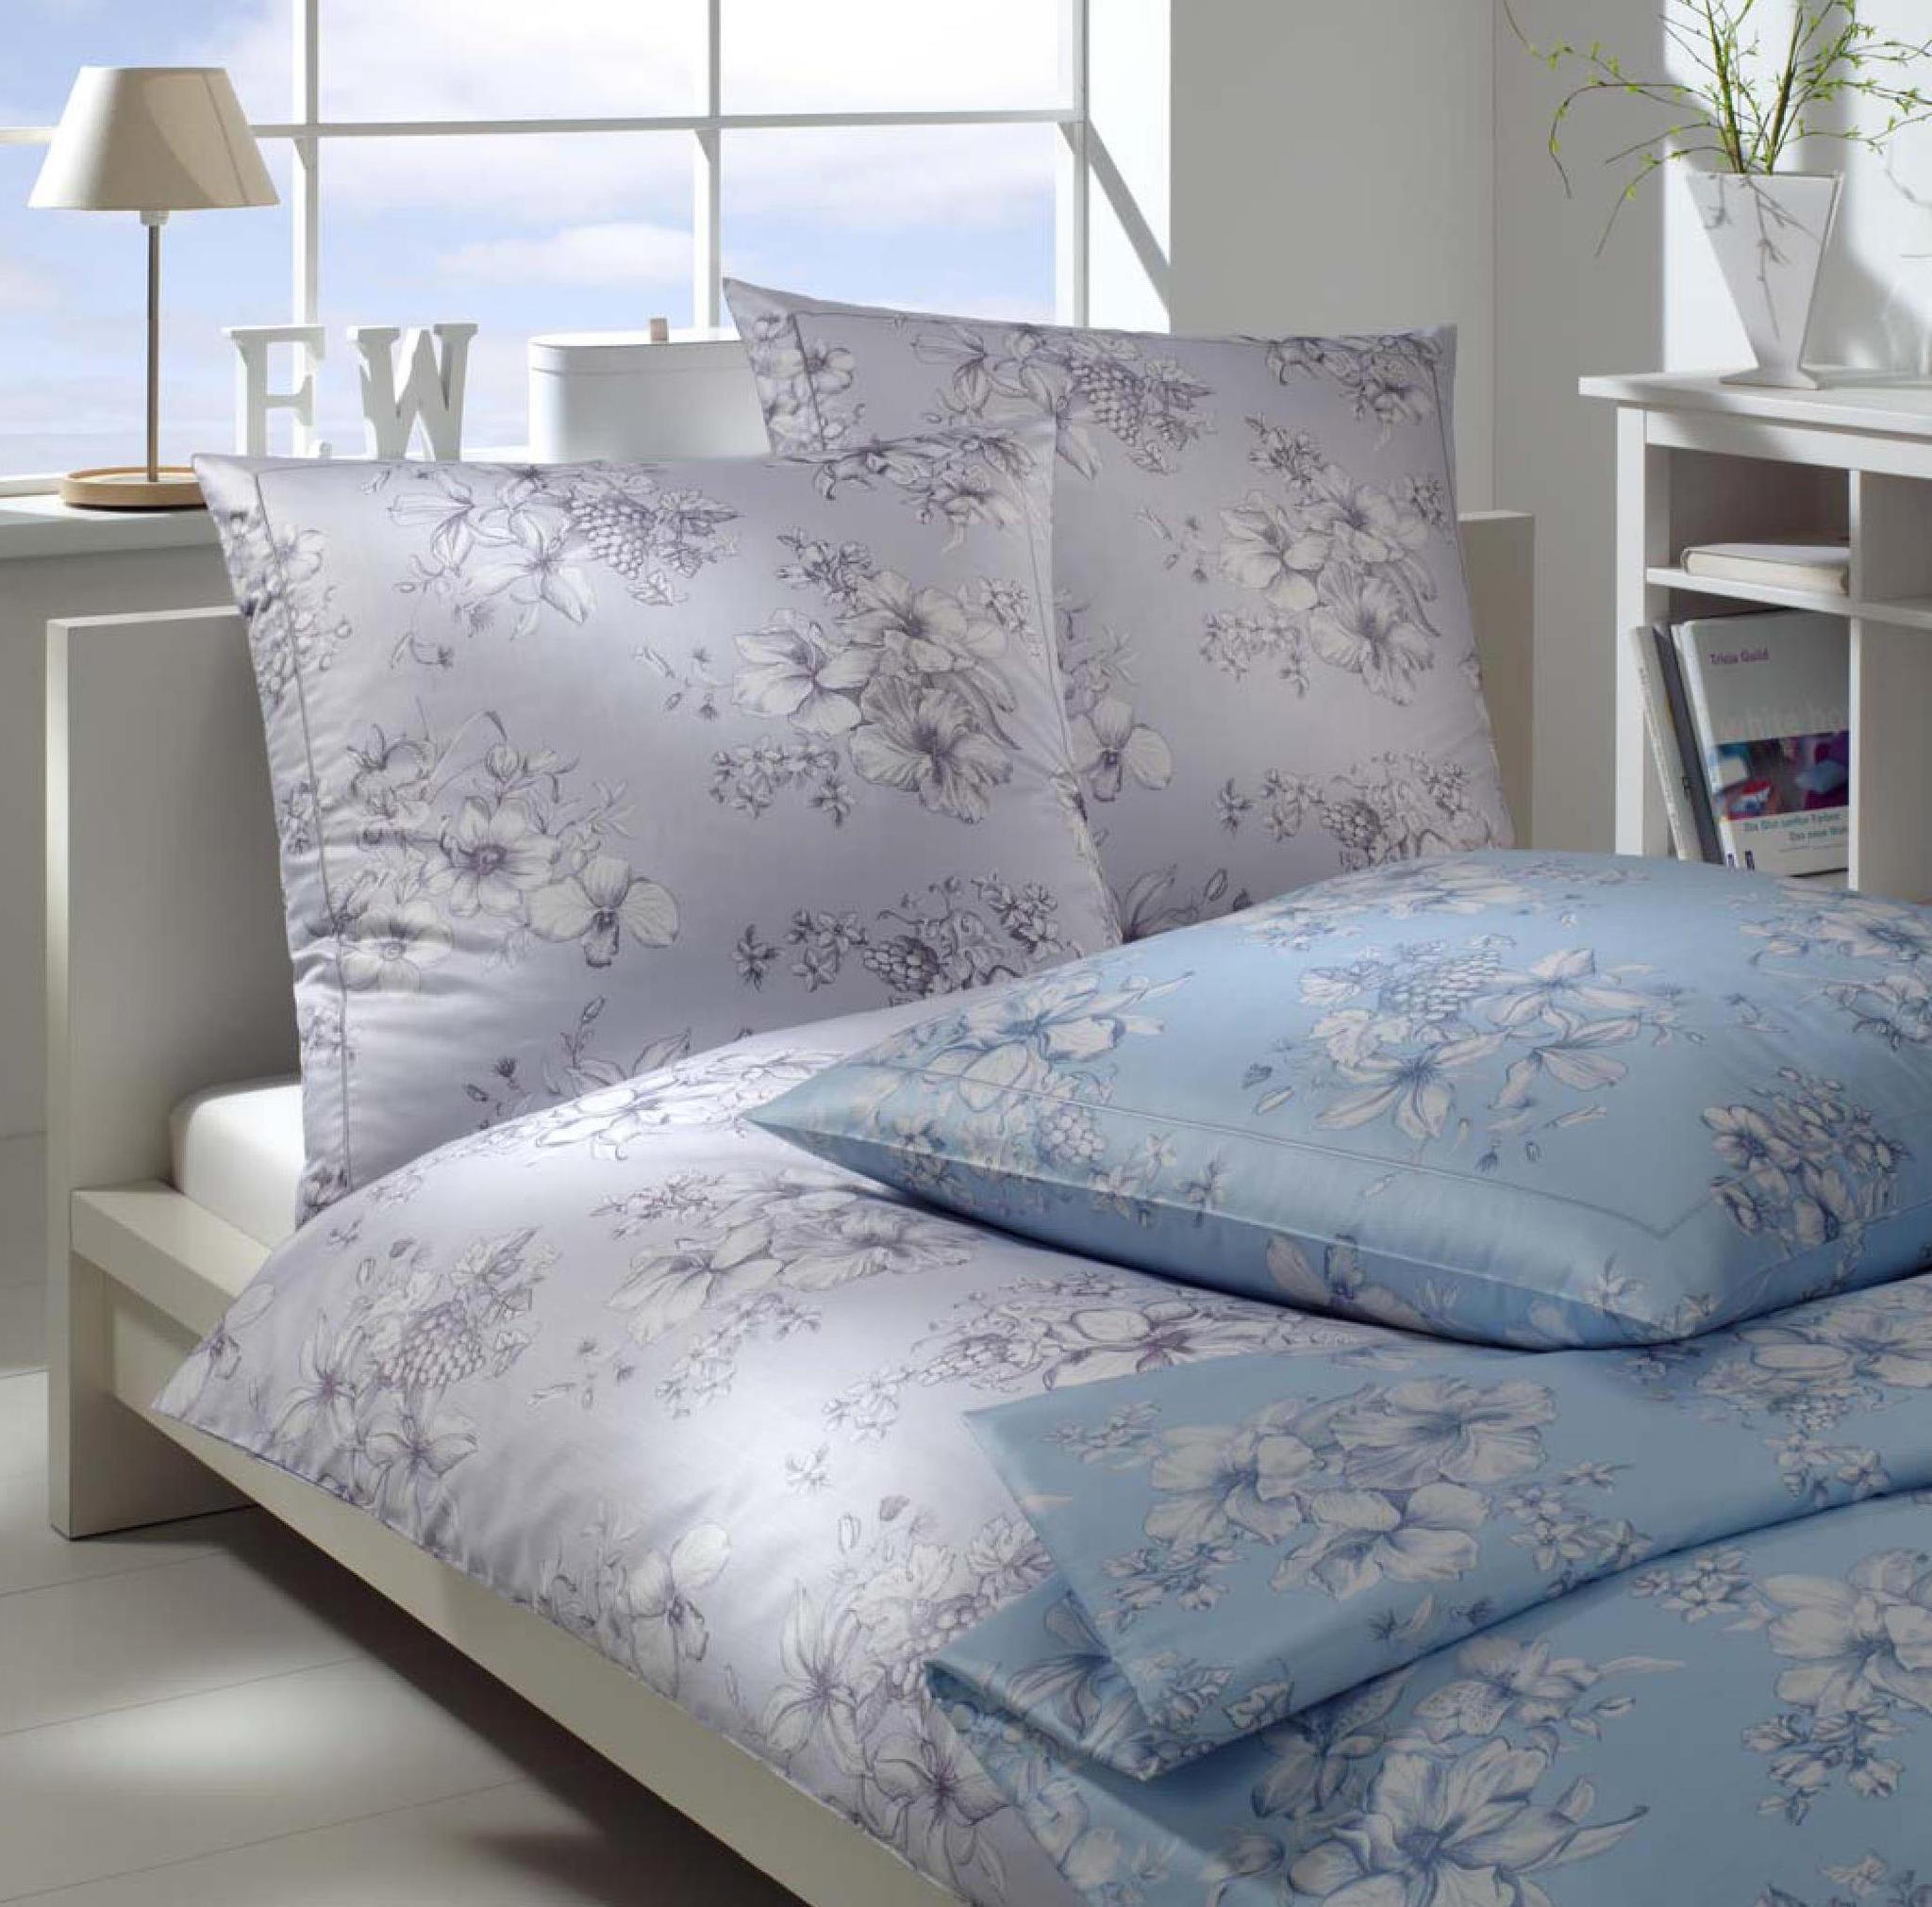 Для сна Наволочка 50x70 Elegante Fleurie синяя elitnaya-navolochka-fleurie-sinyaya-ot-elegante-germaniya.jpg